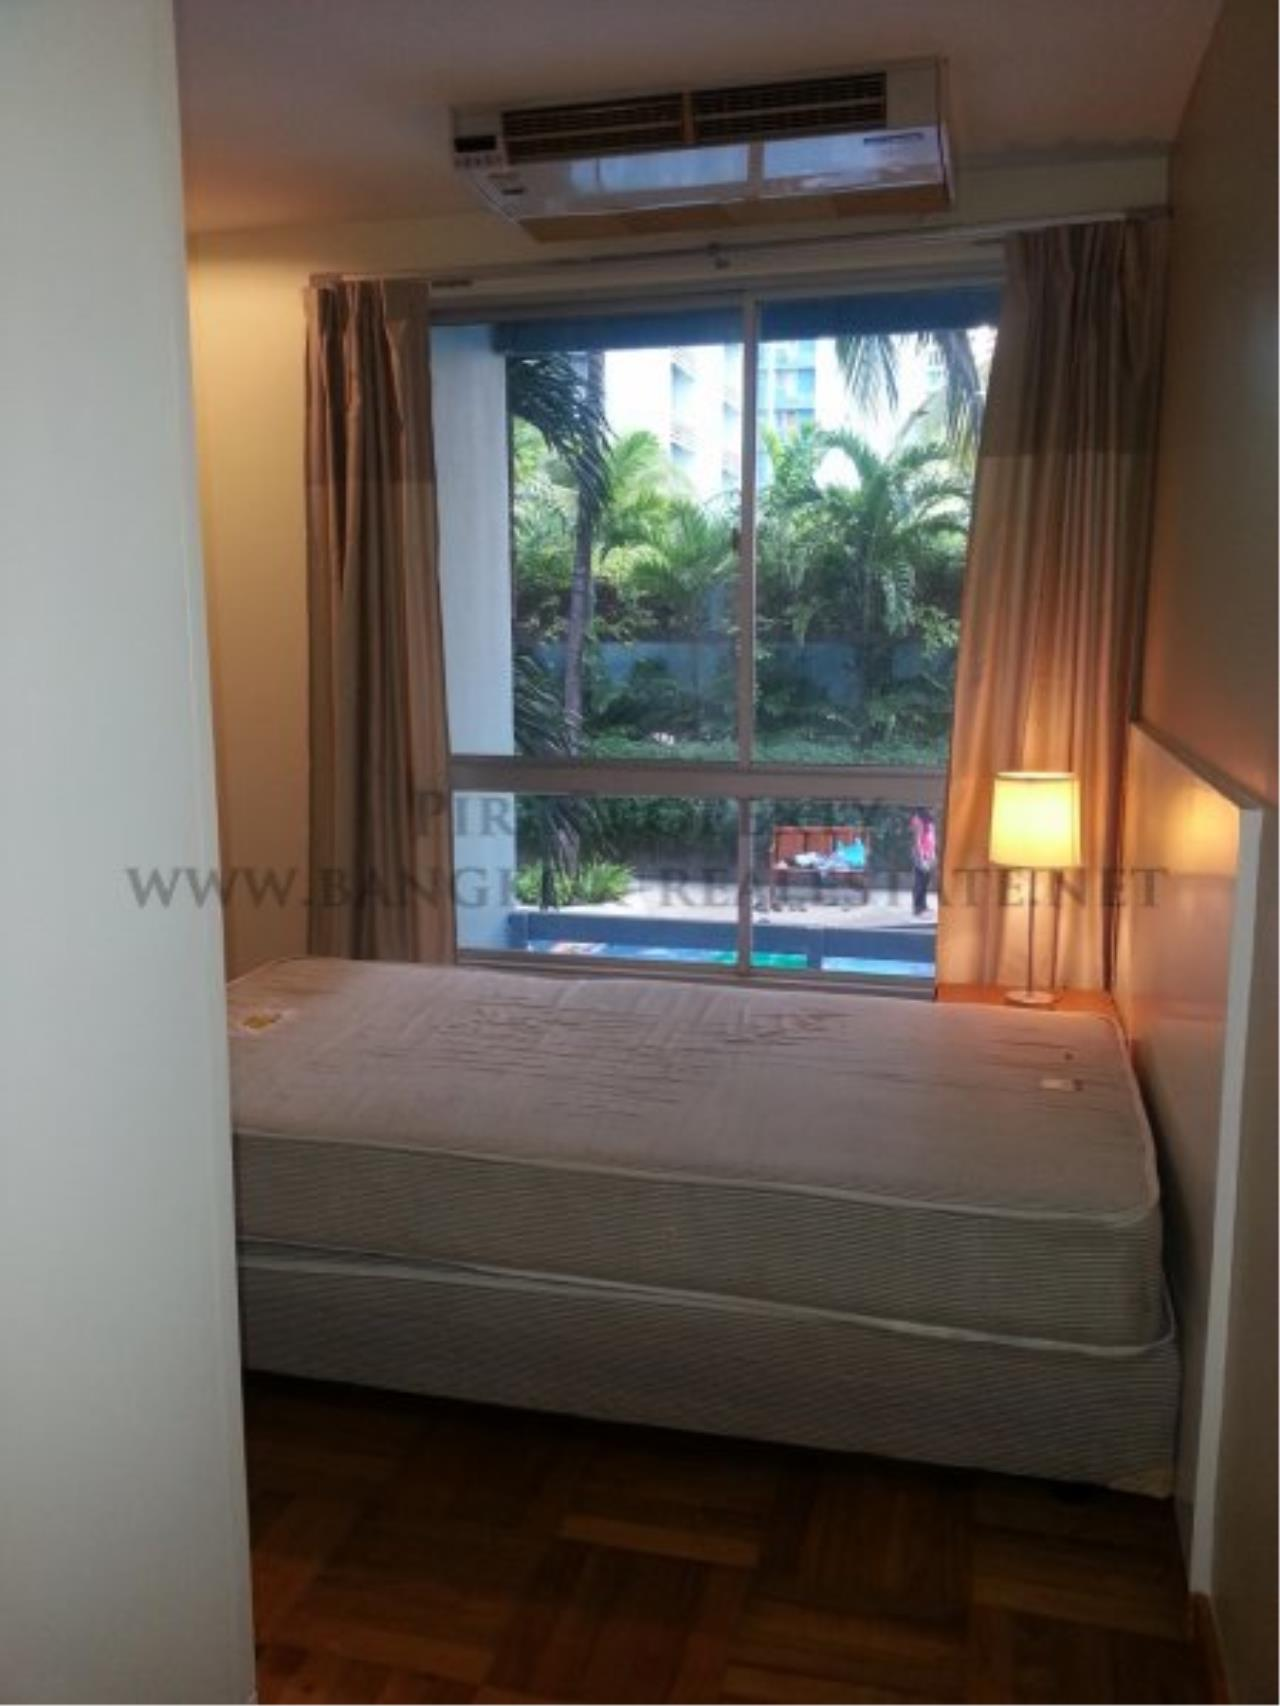 Piri Property Agency's Bangkok Garden - Spacious 2 Bedroom for 28K - Low Floor 4